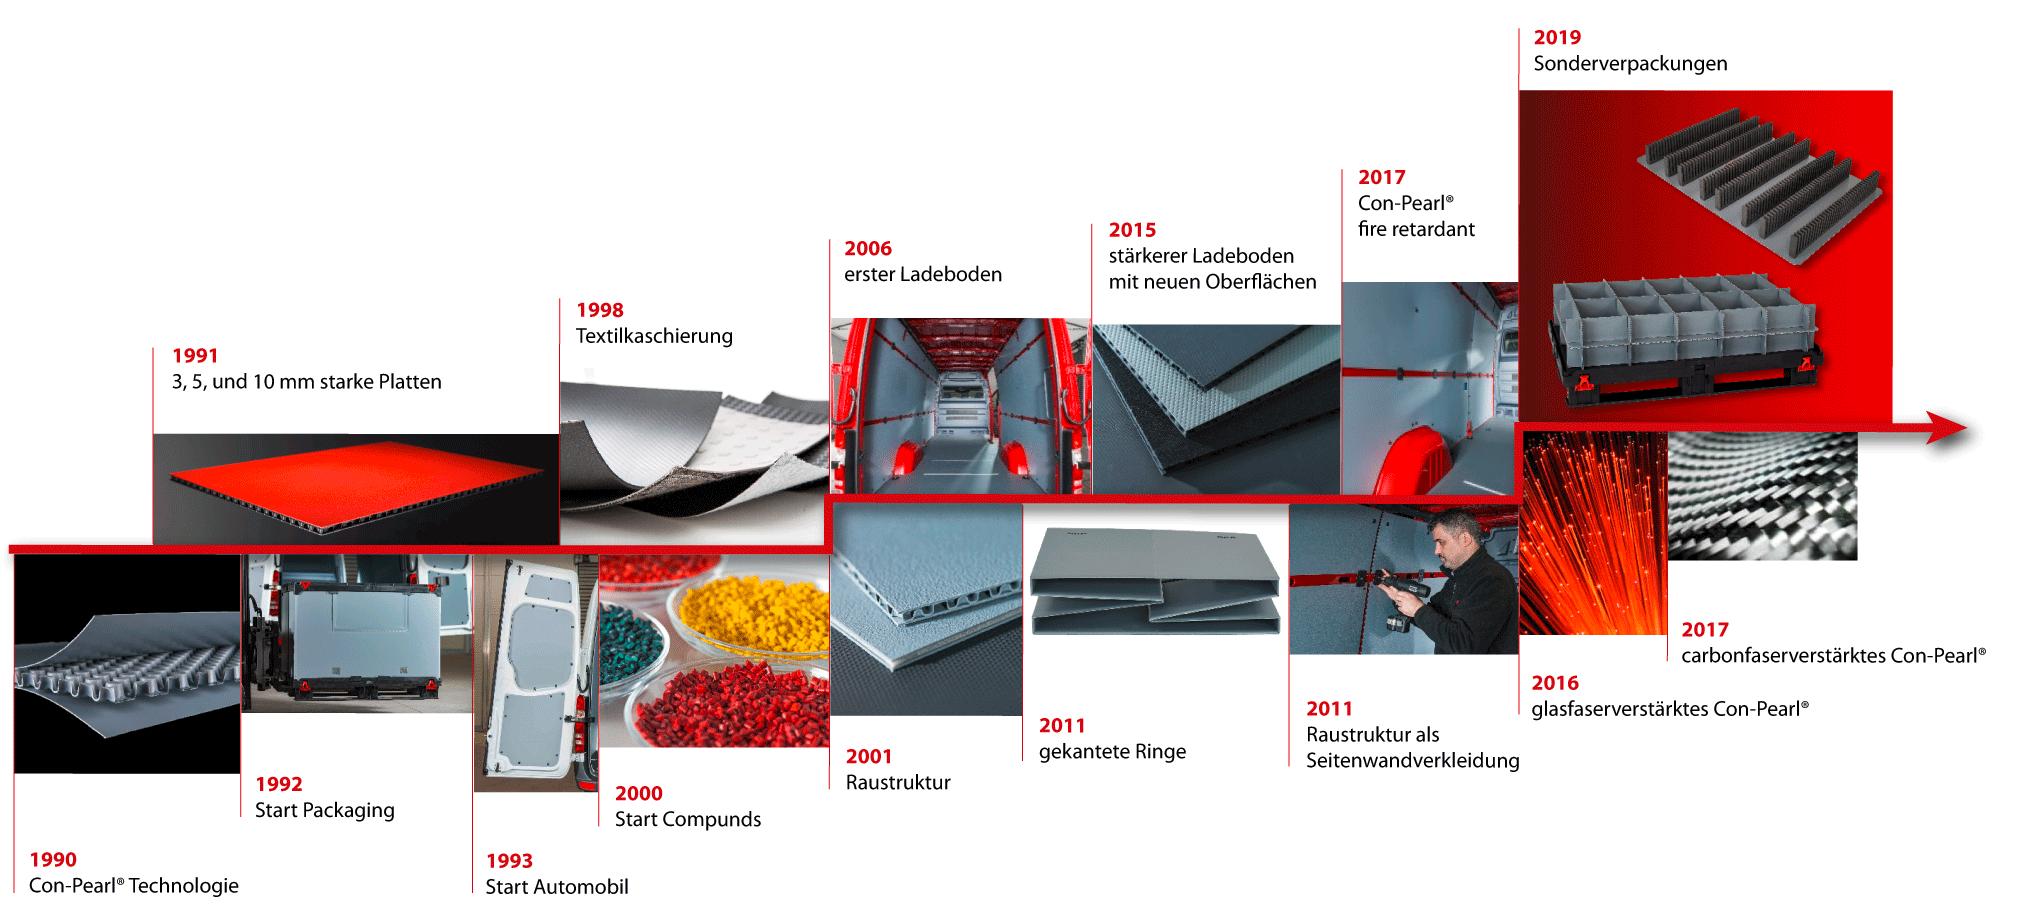 Historie friedola TECH GmbH